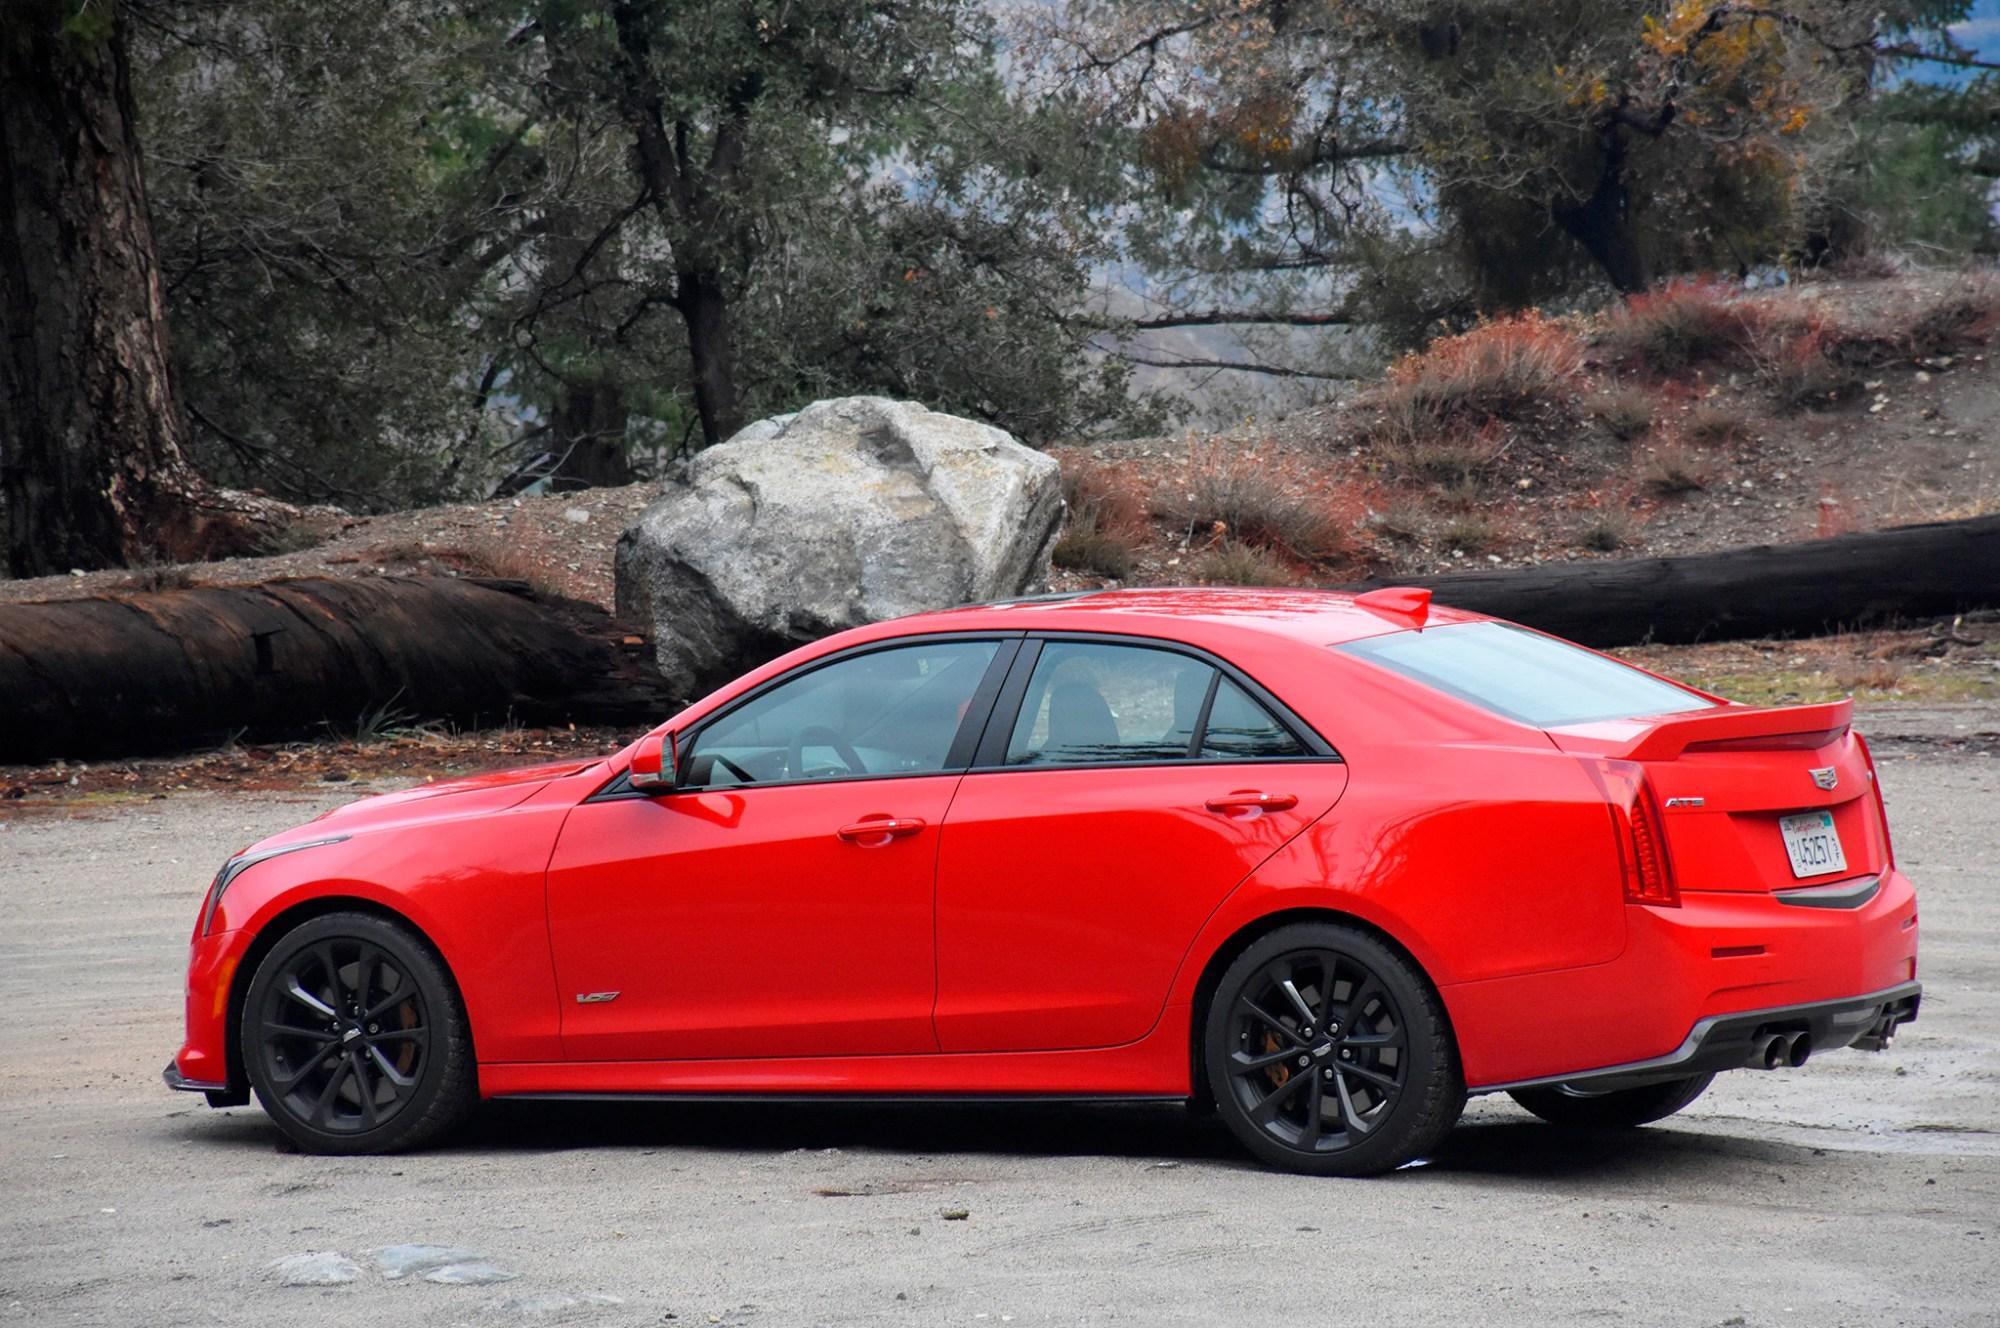 hight resolution of 2017 cadillac ats v sedan one week review automobile cadillac ats 6 speed cadillac ats manual transmission review